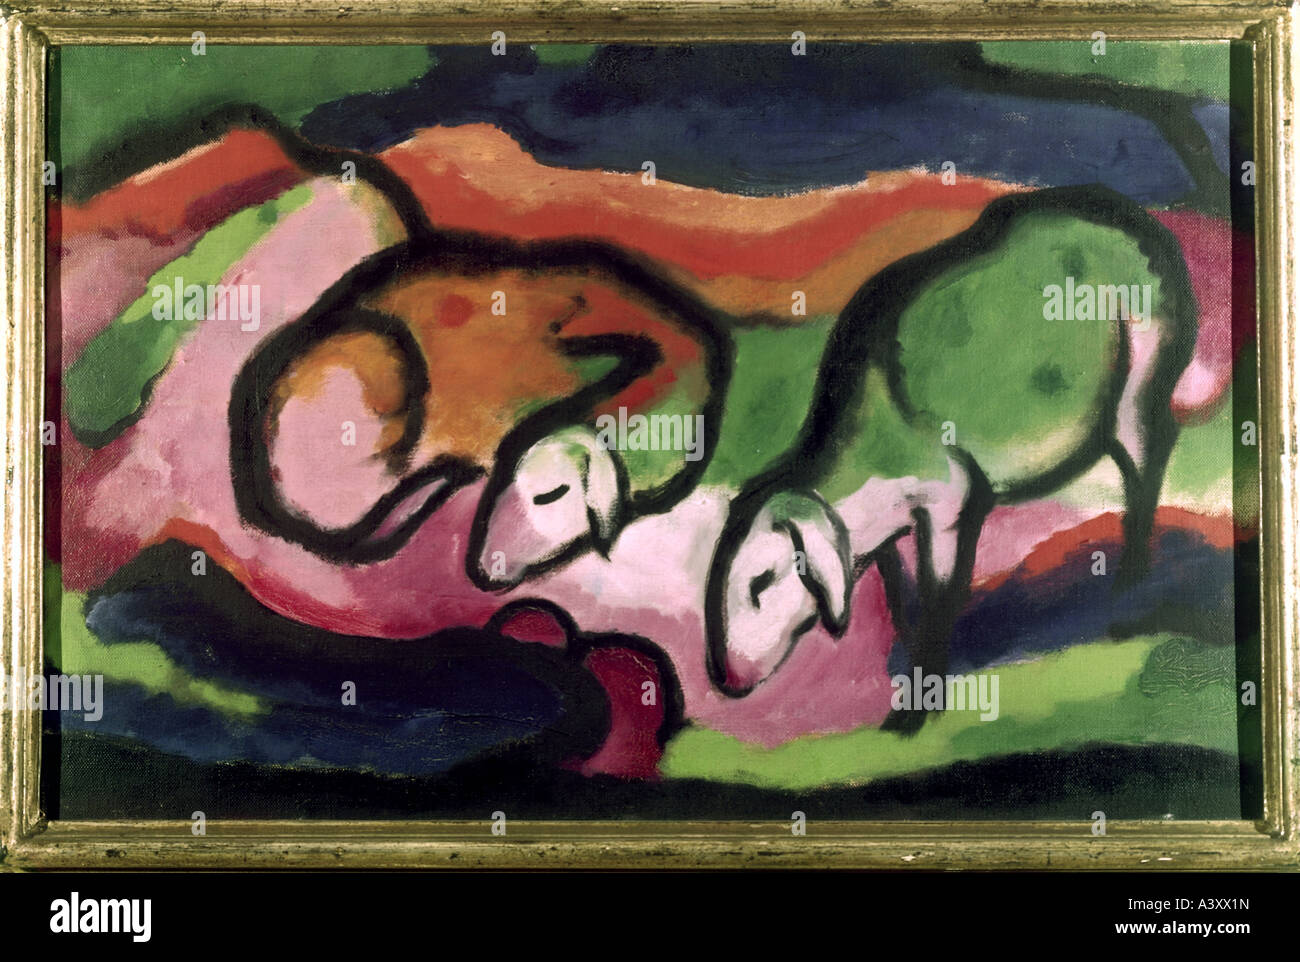 """Belle Arti, Marc Franz, (1880 - 1916), pittura, 'Ssfregare', 'sheep"", 1912, olio su tela, 49,5 cm x 77 cm, Saarland Foto Stock"